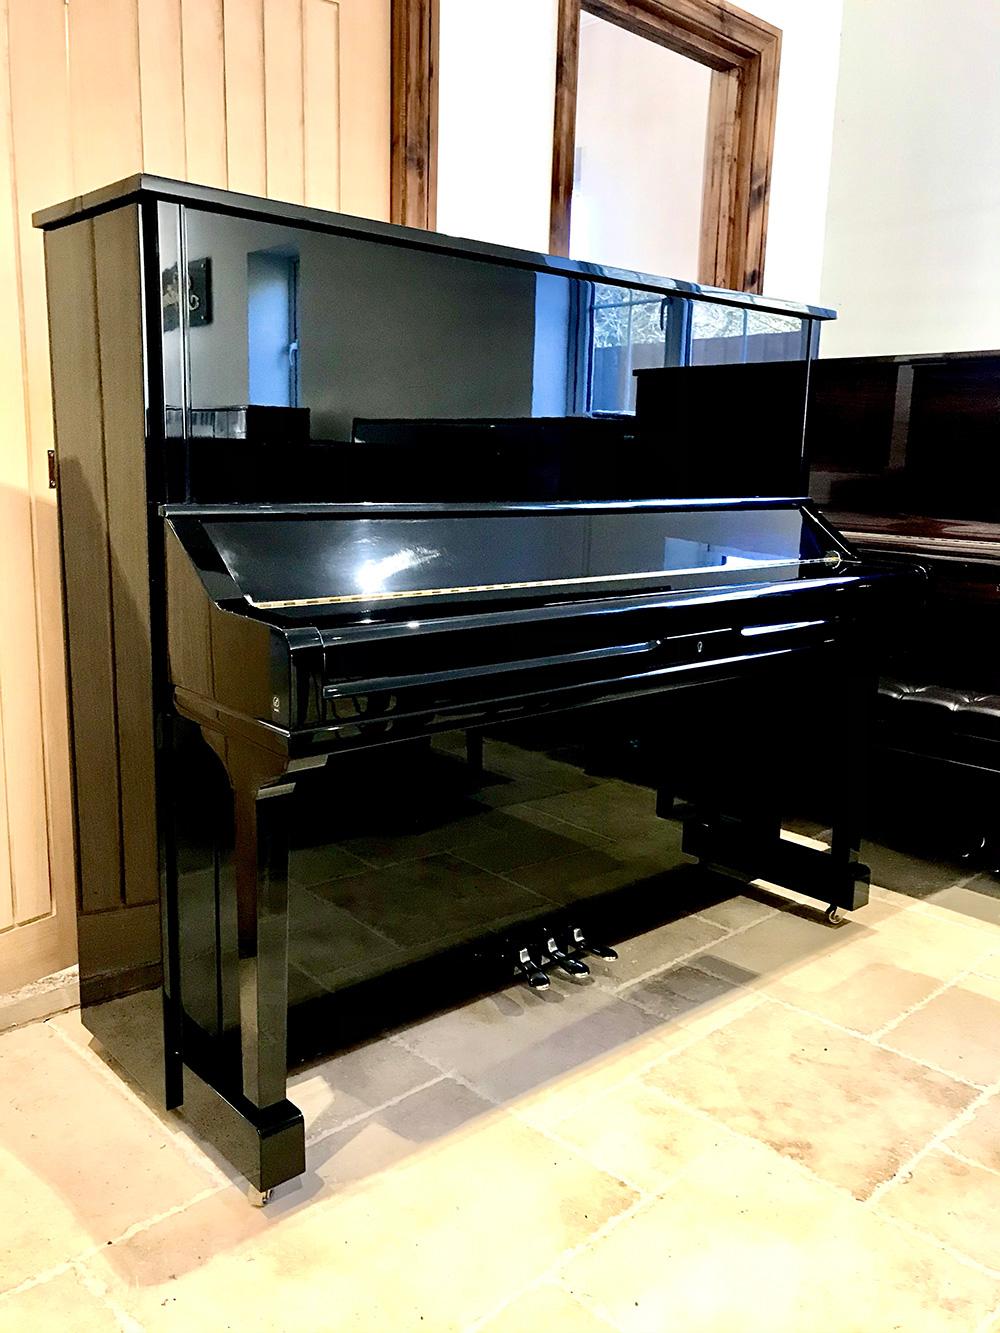 Yamaha-U3S-Piano-Dorset-1.jpg